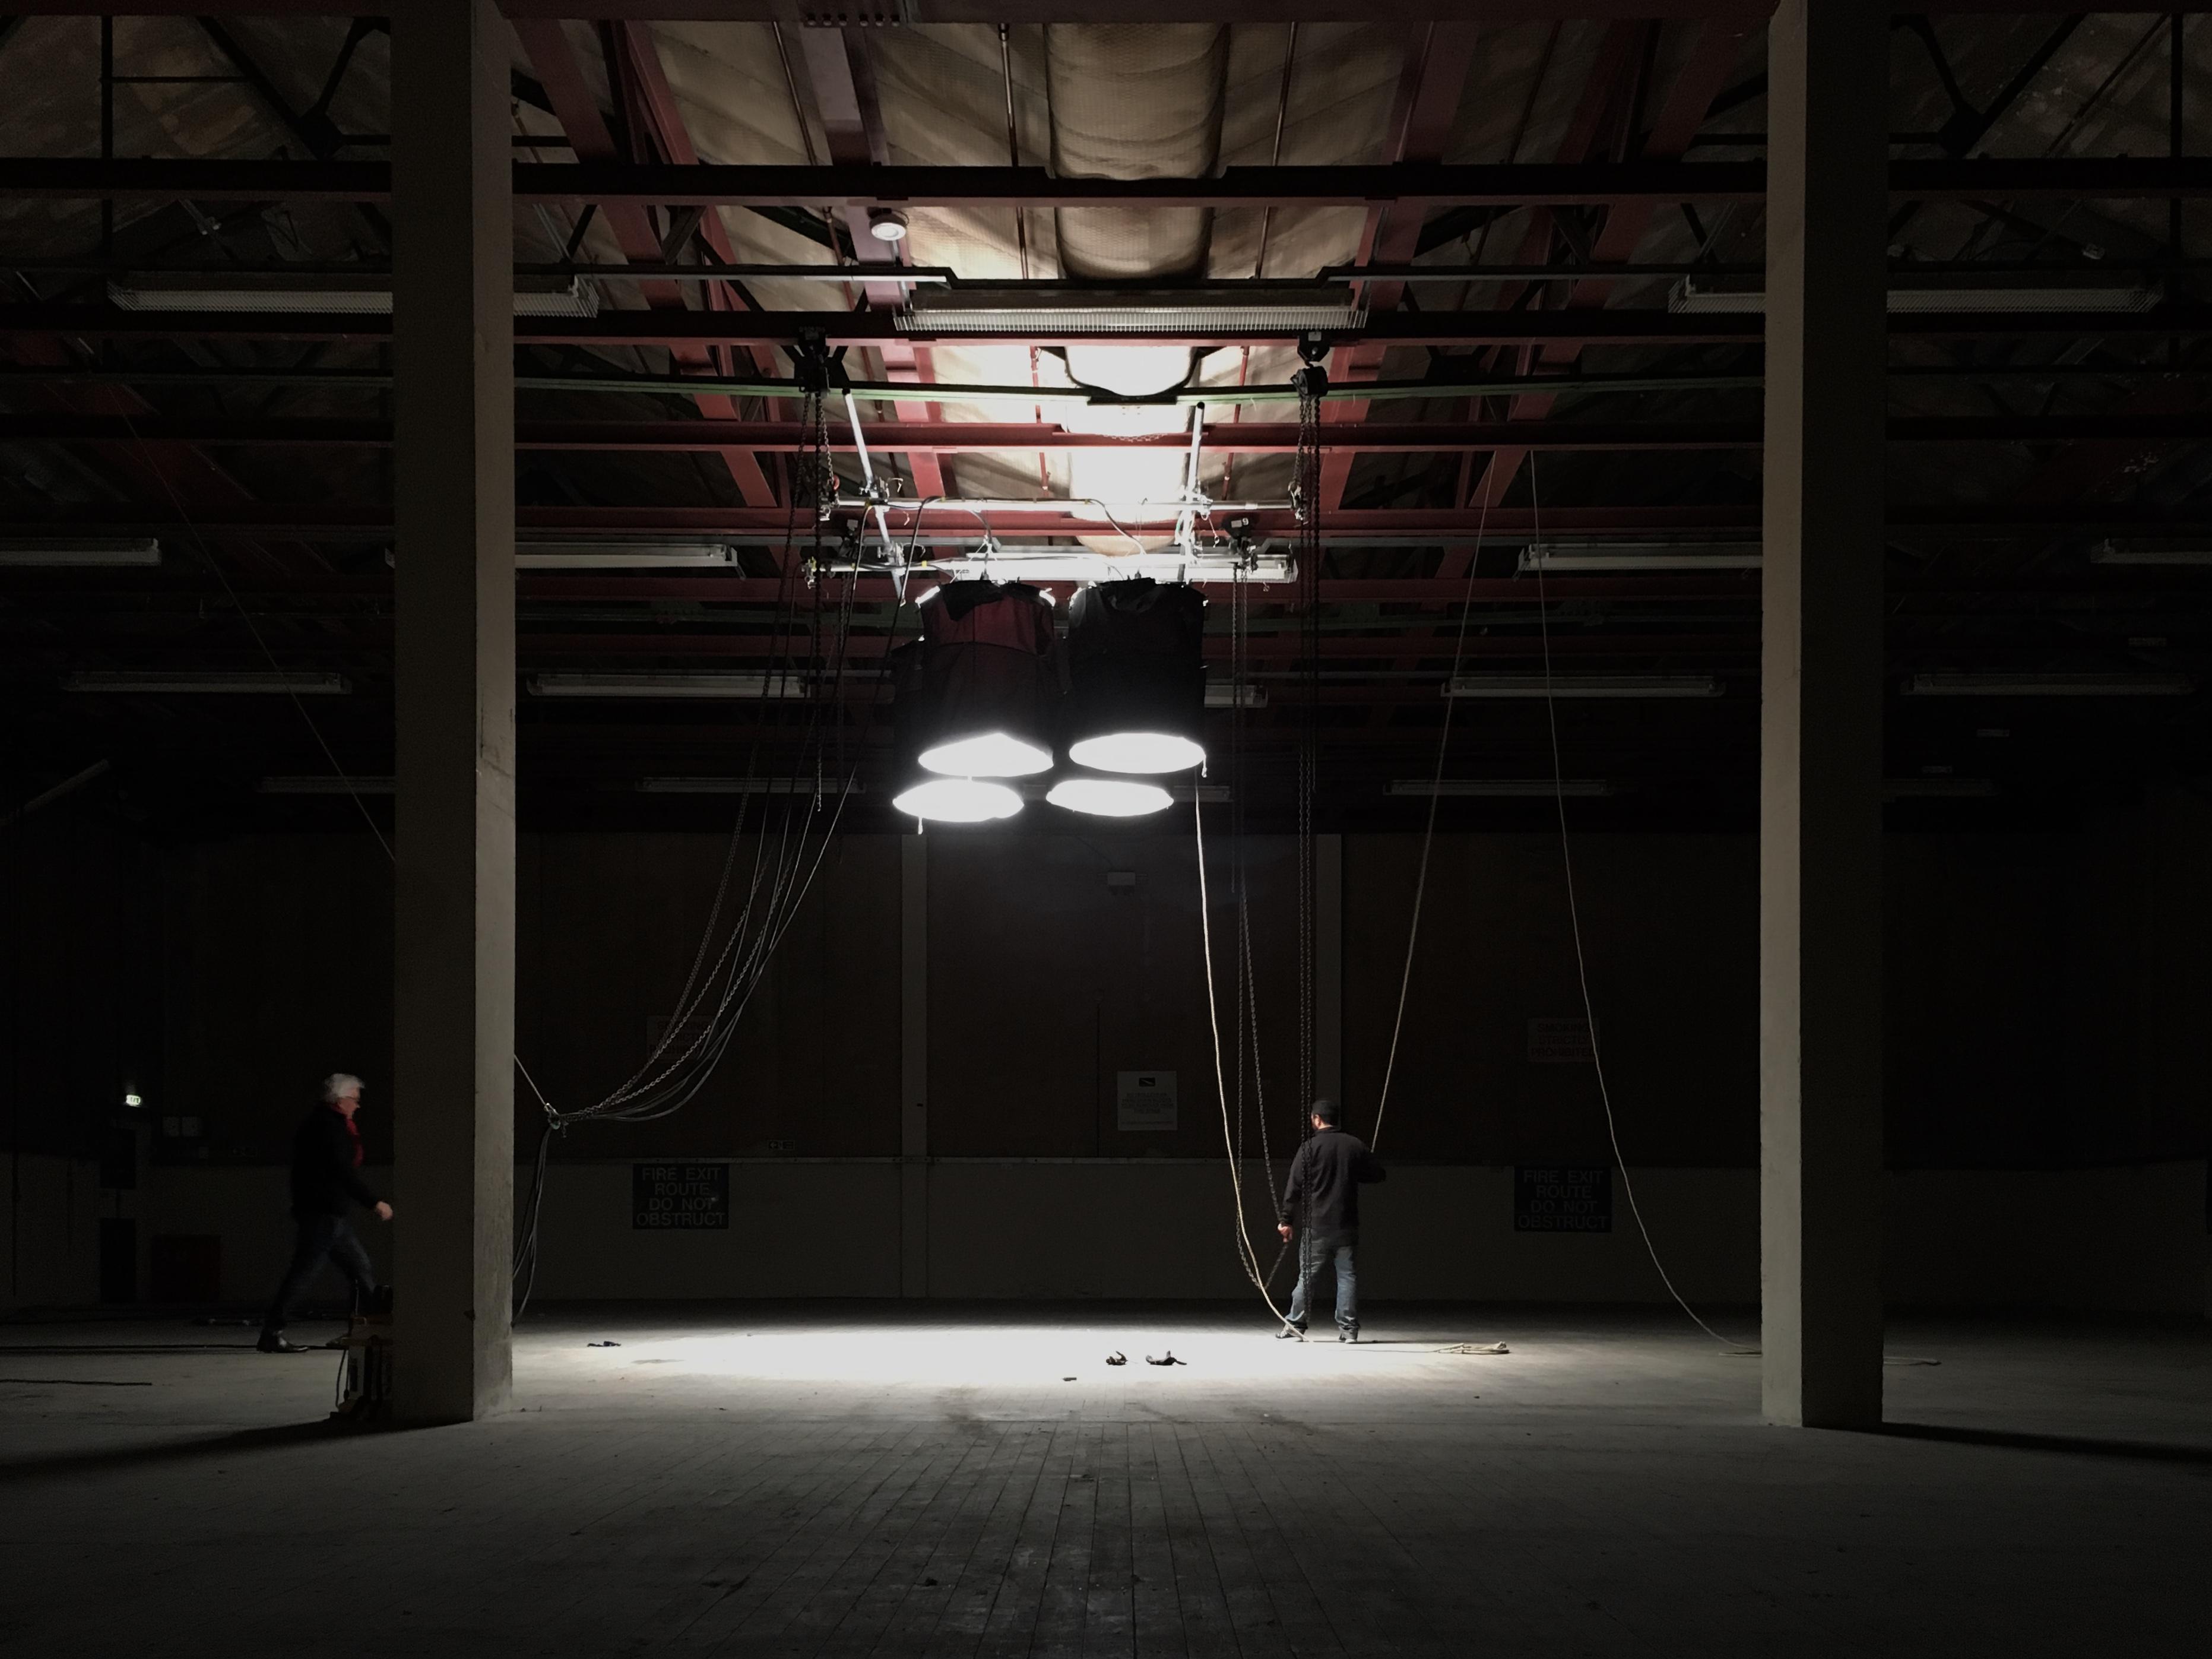 Pre-lighting at Pinewood